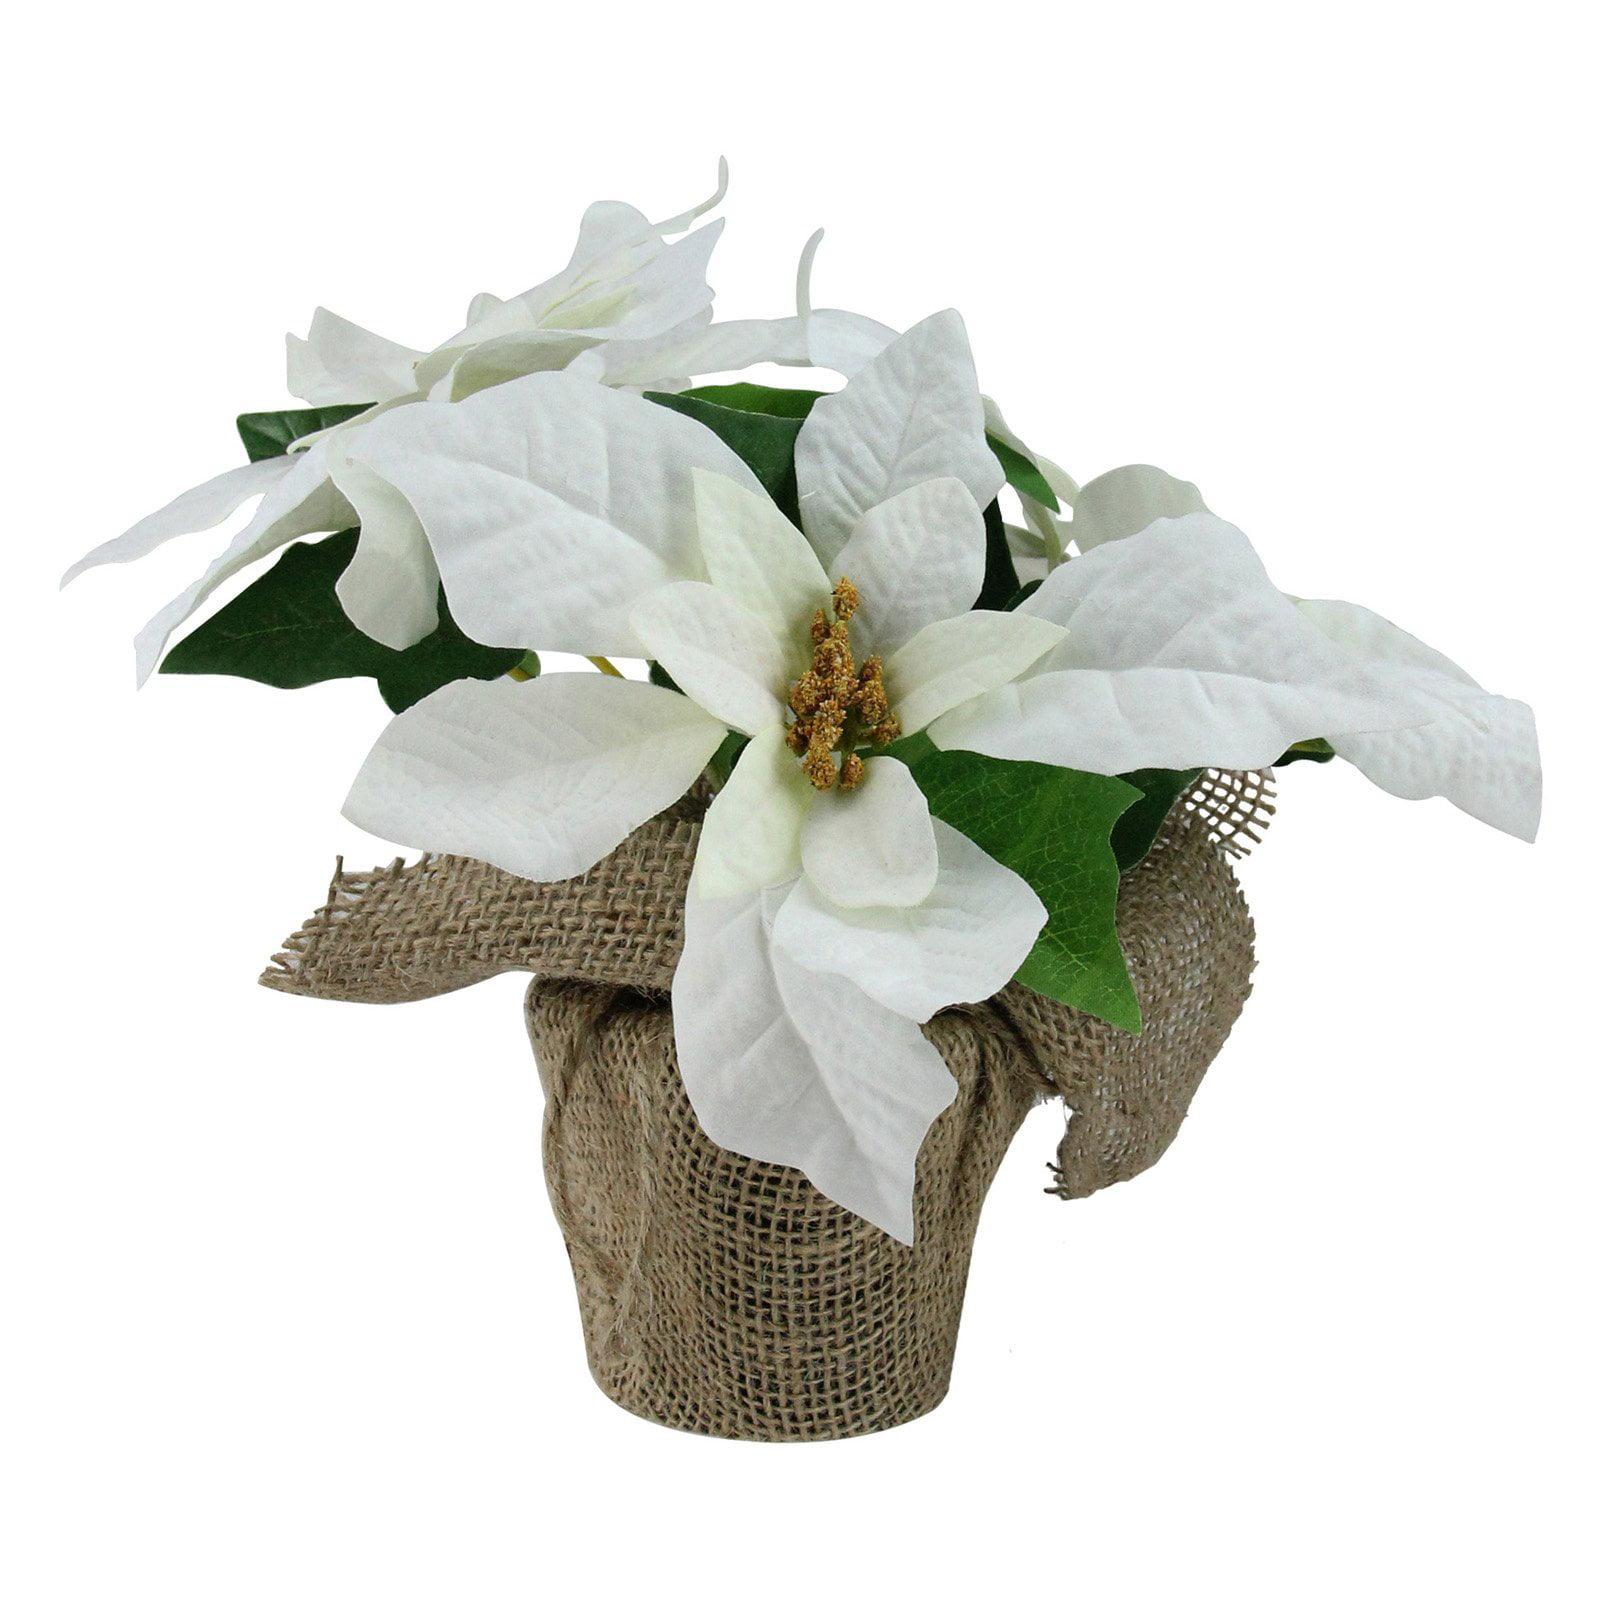 Northlight White Artificial Christmas Poinsettia Flower Arrangement